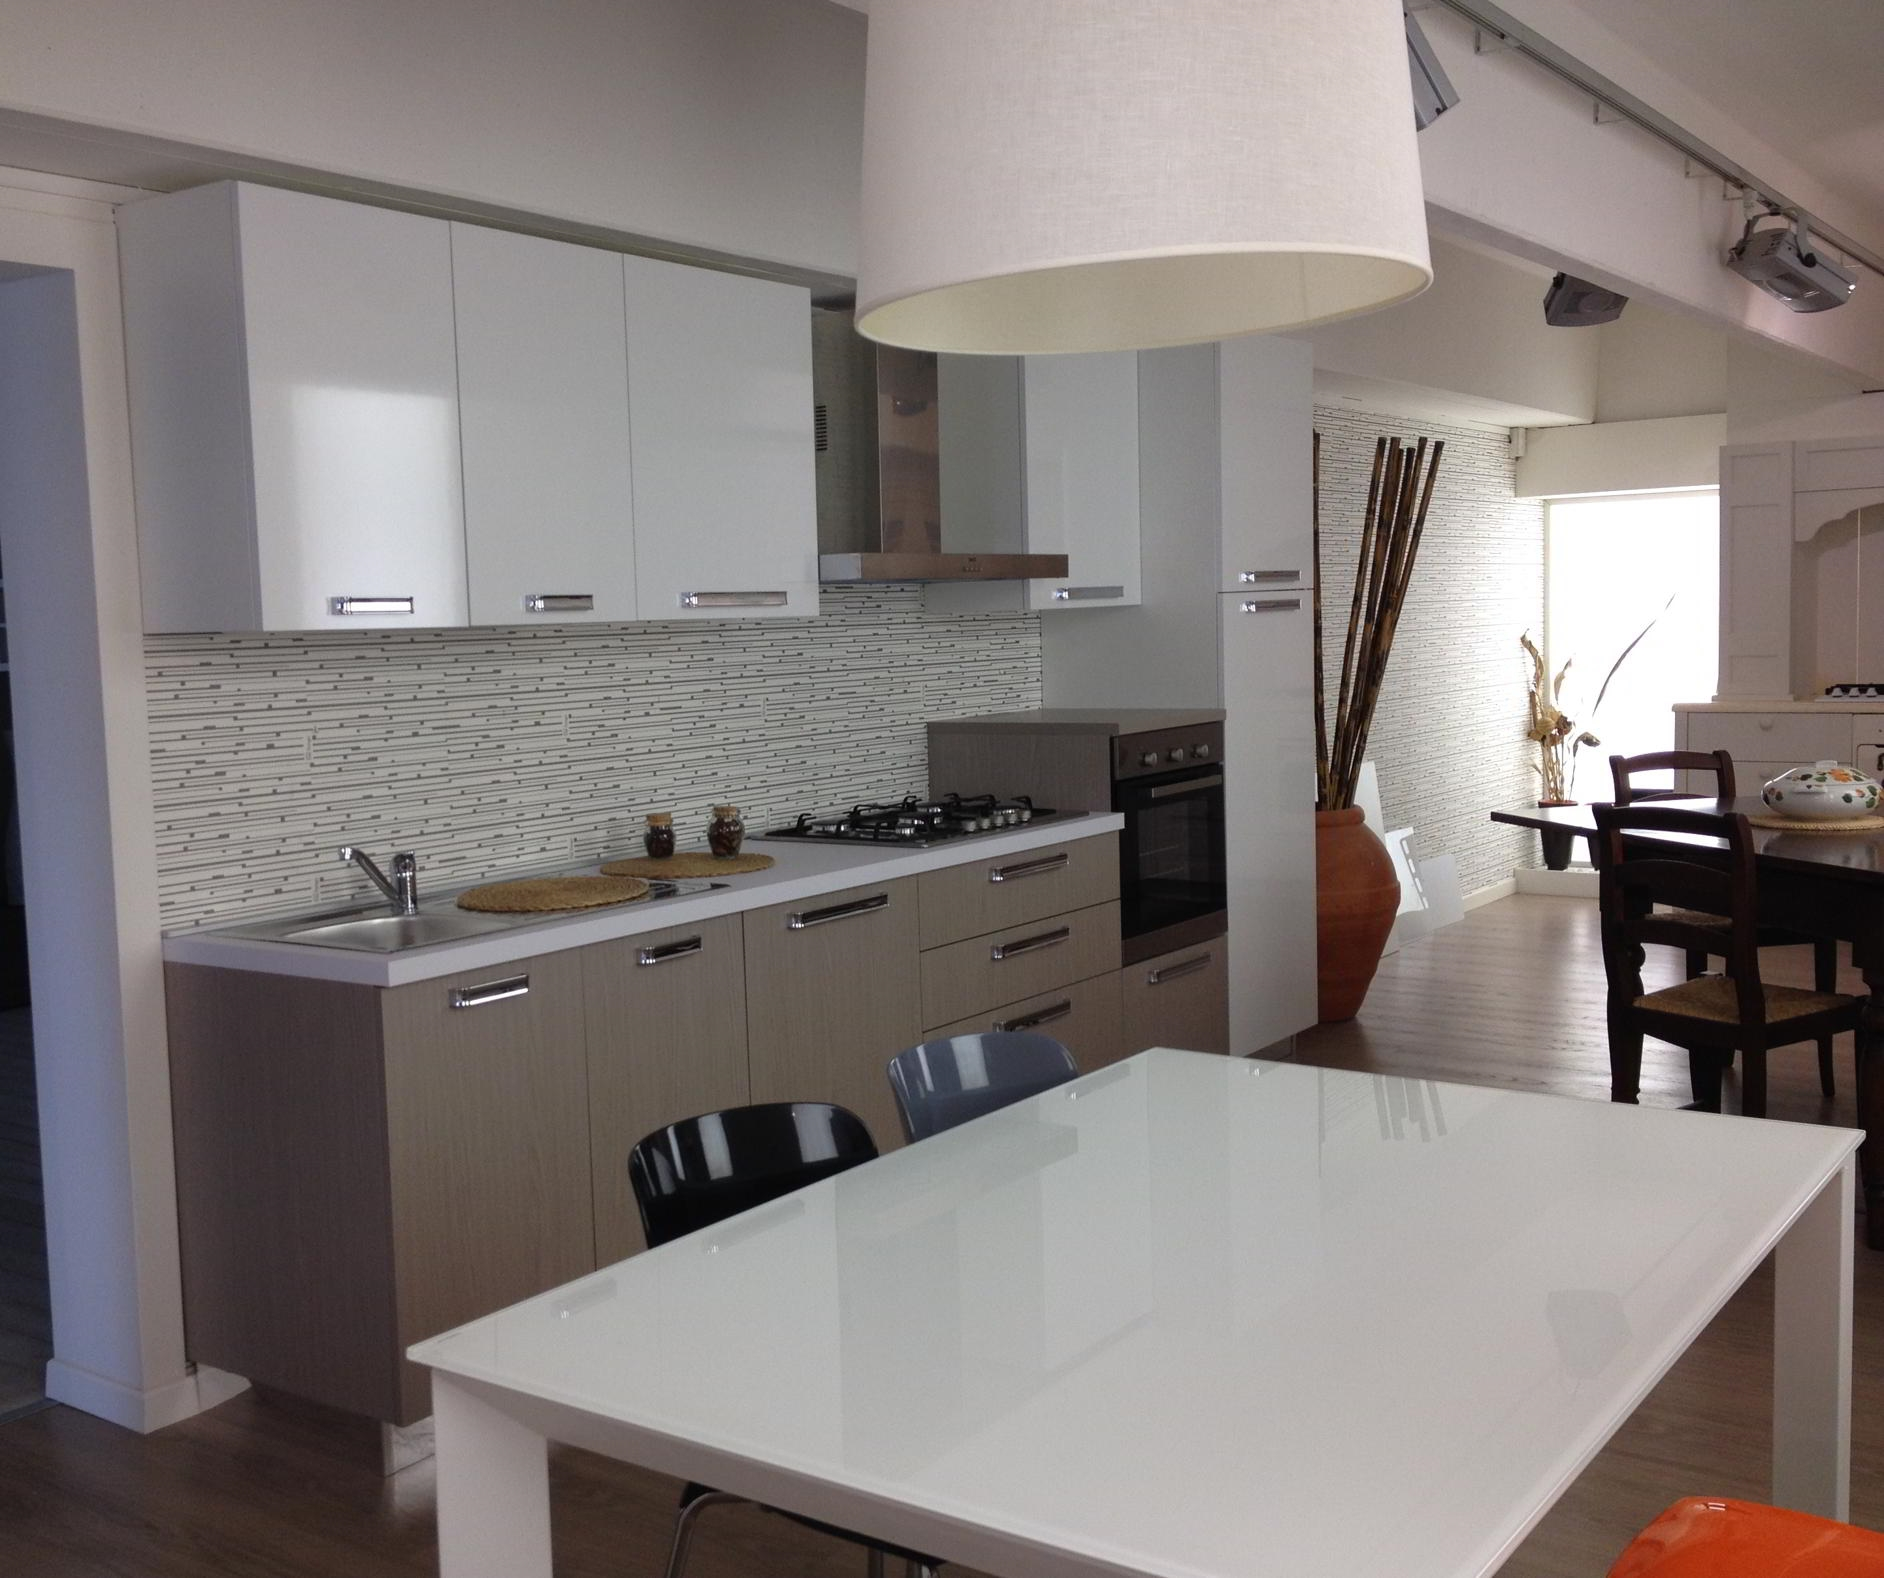 Vetrinette moderne a parete - Arredamento cucine moderne ...